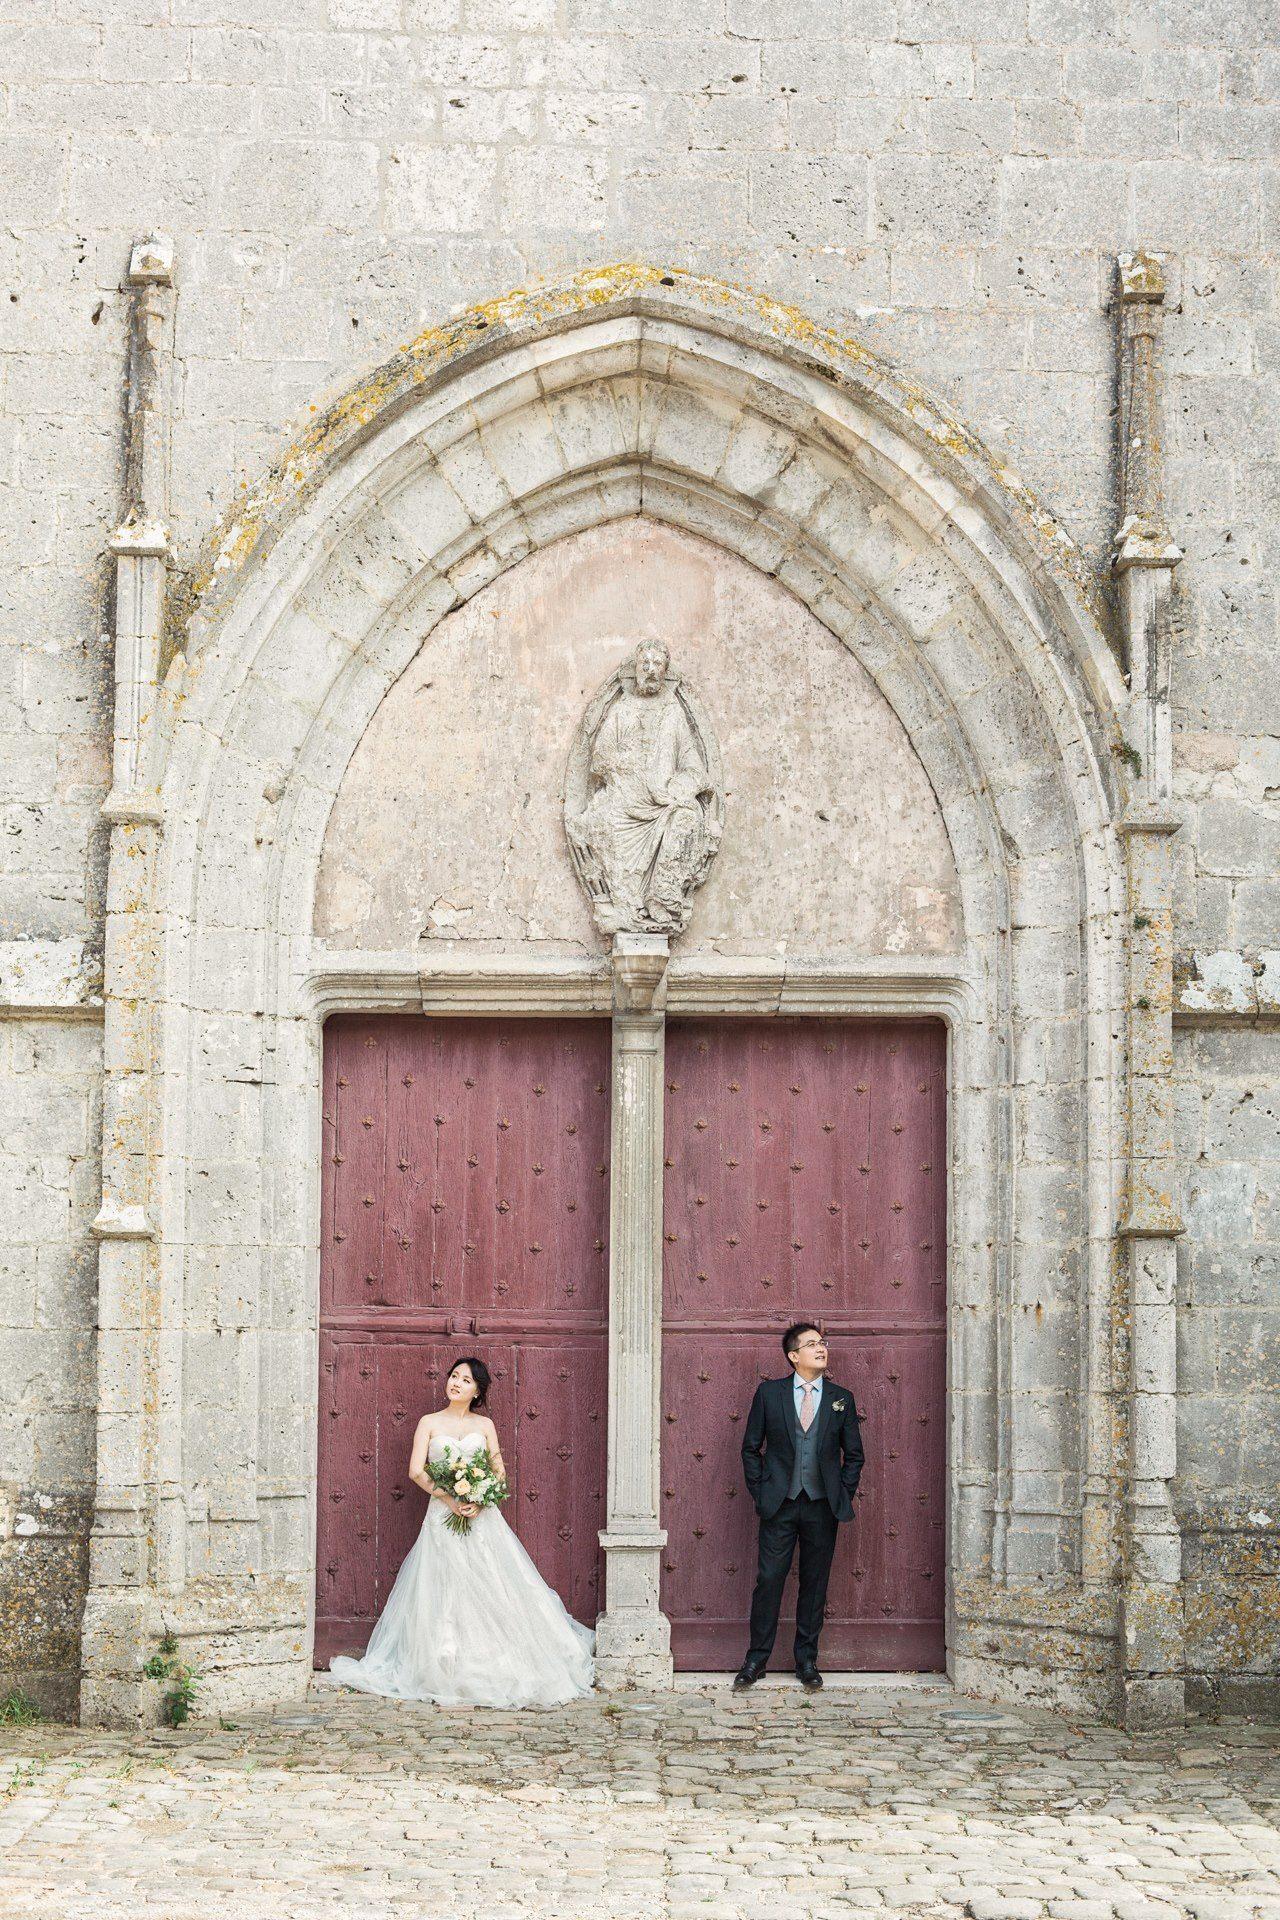 海外婚紗新秘/南法普羅Provins, France